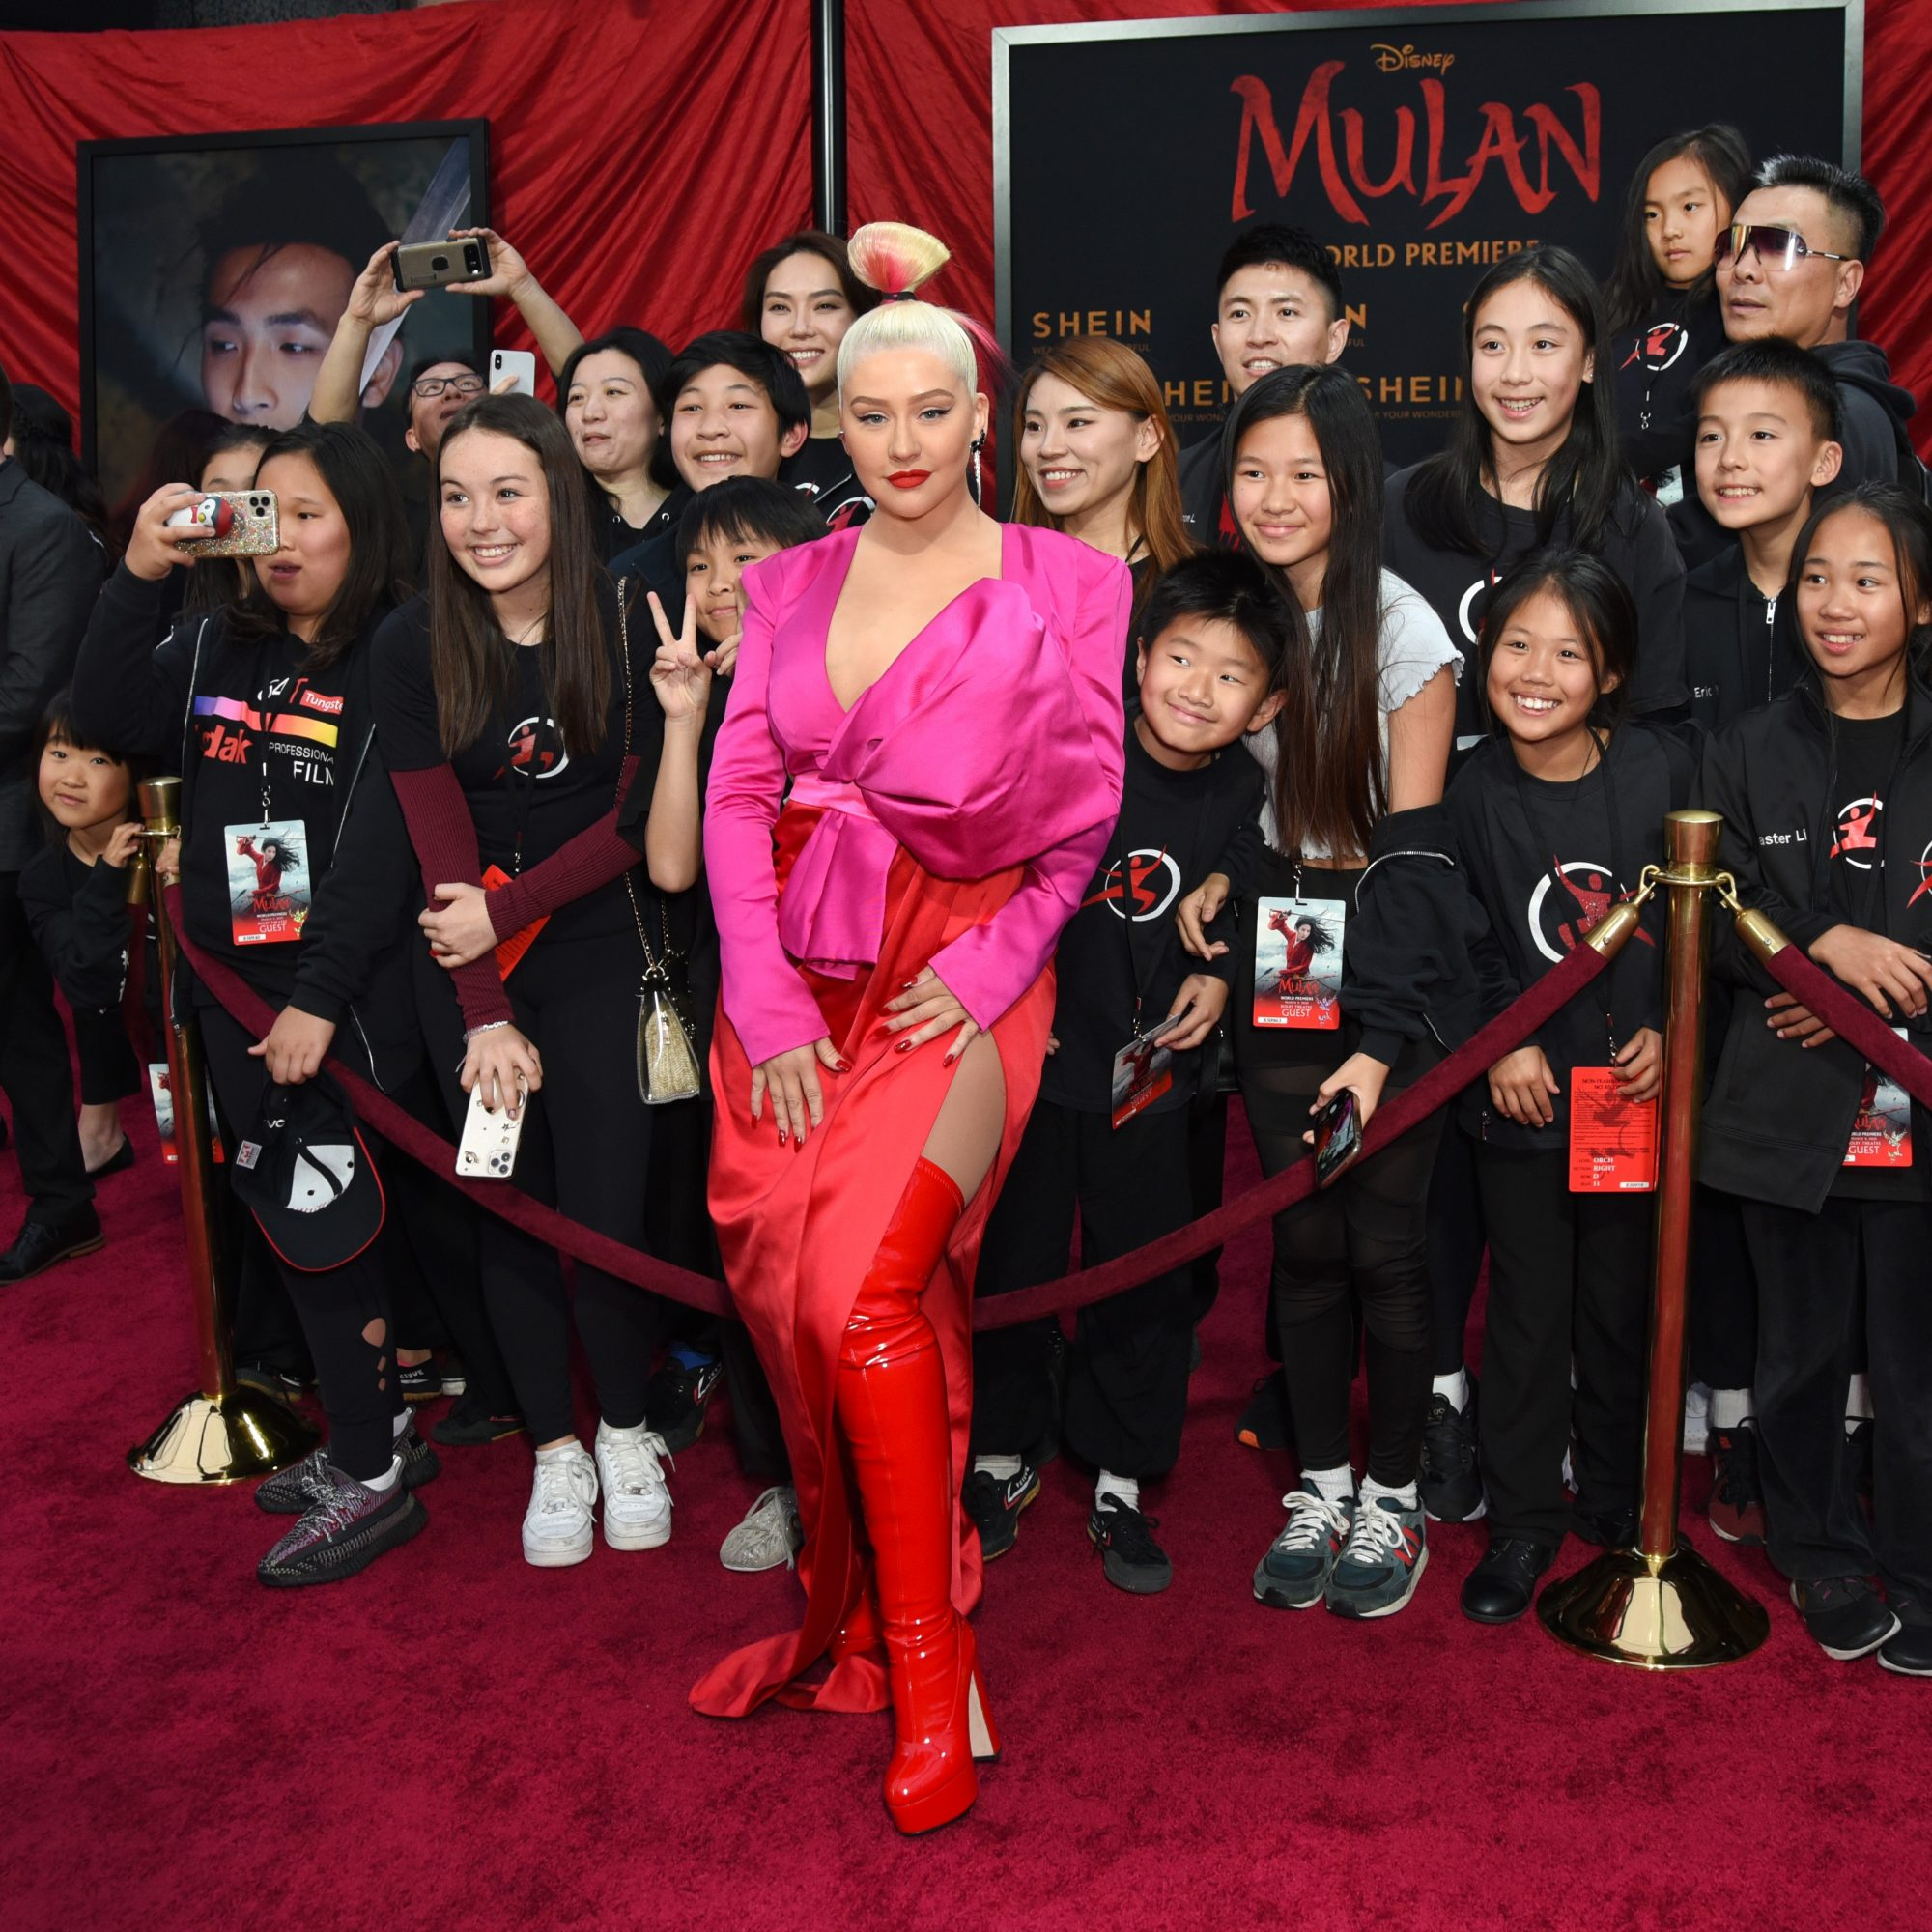 Christina Aguilera guapísima en la alfombra roja de la premiere de la cinta Mulan